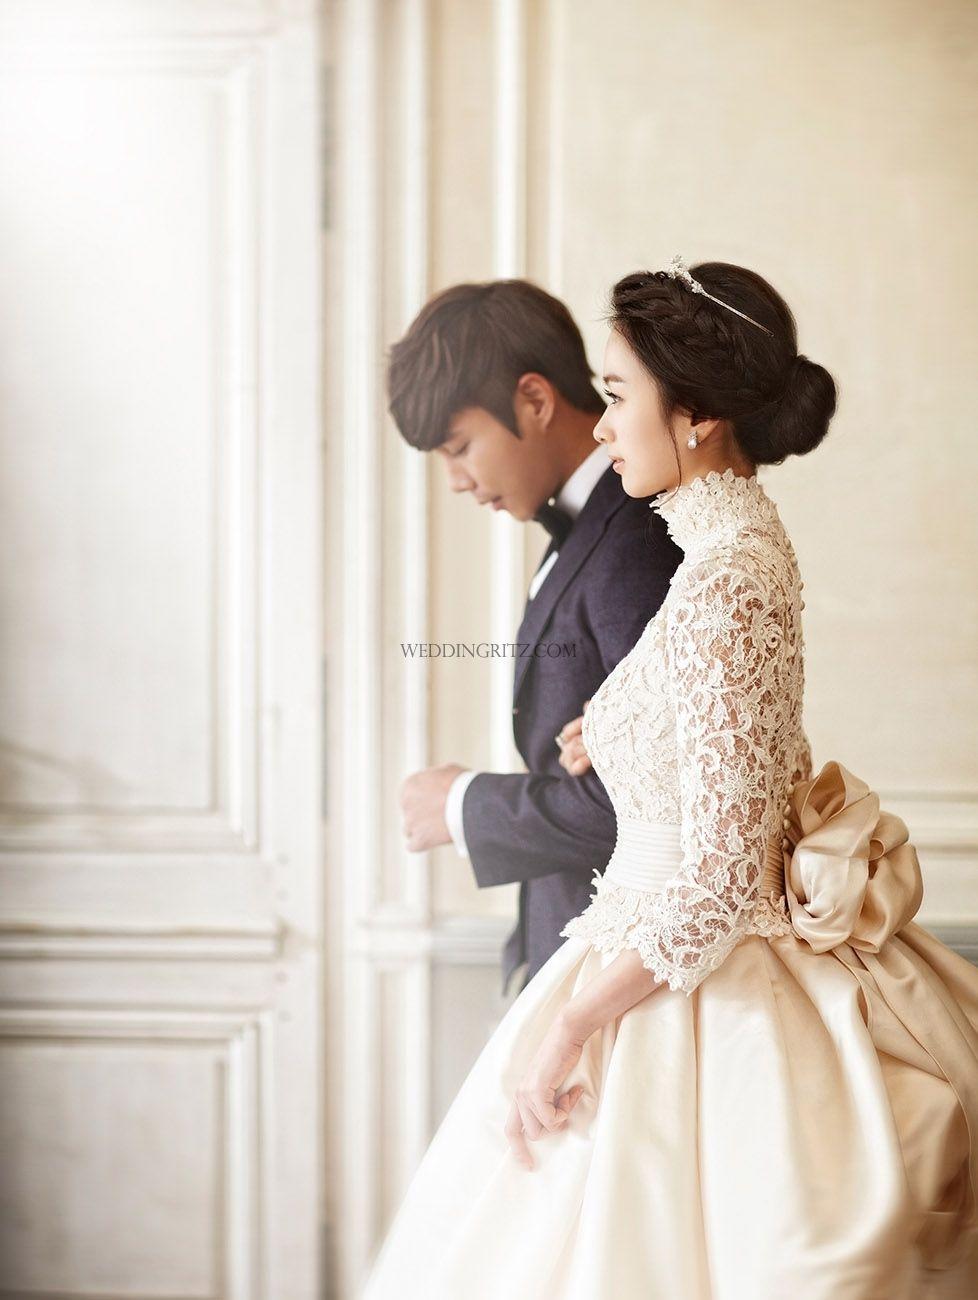 Someday it will be me <3   W e d d i n g   Pinterest   Wedding ...